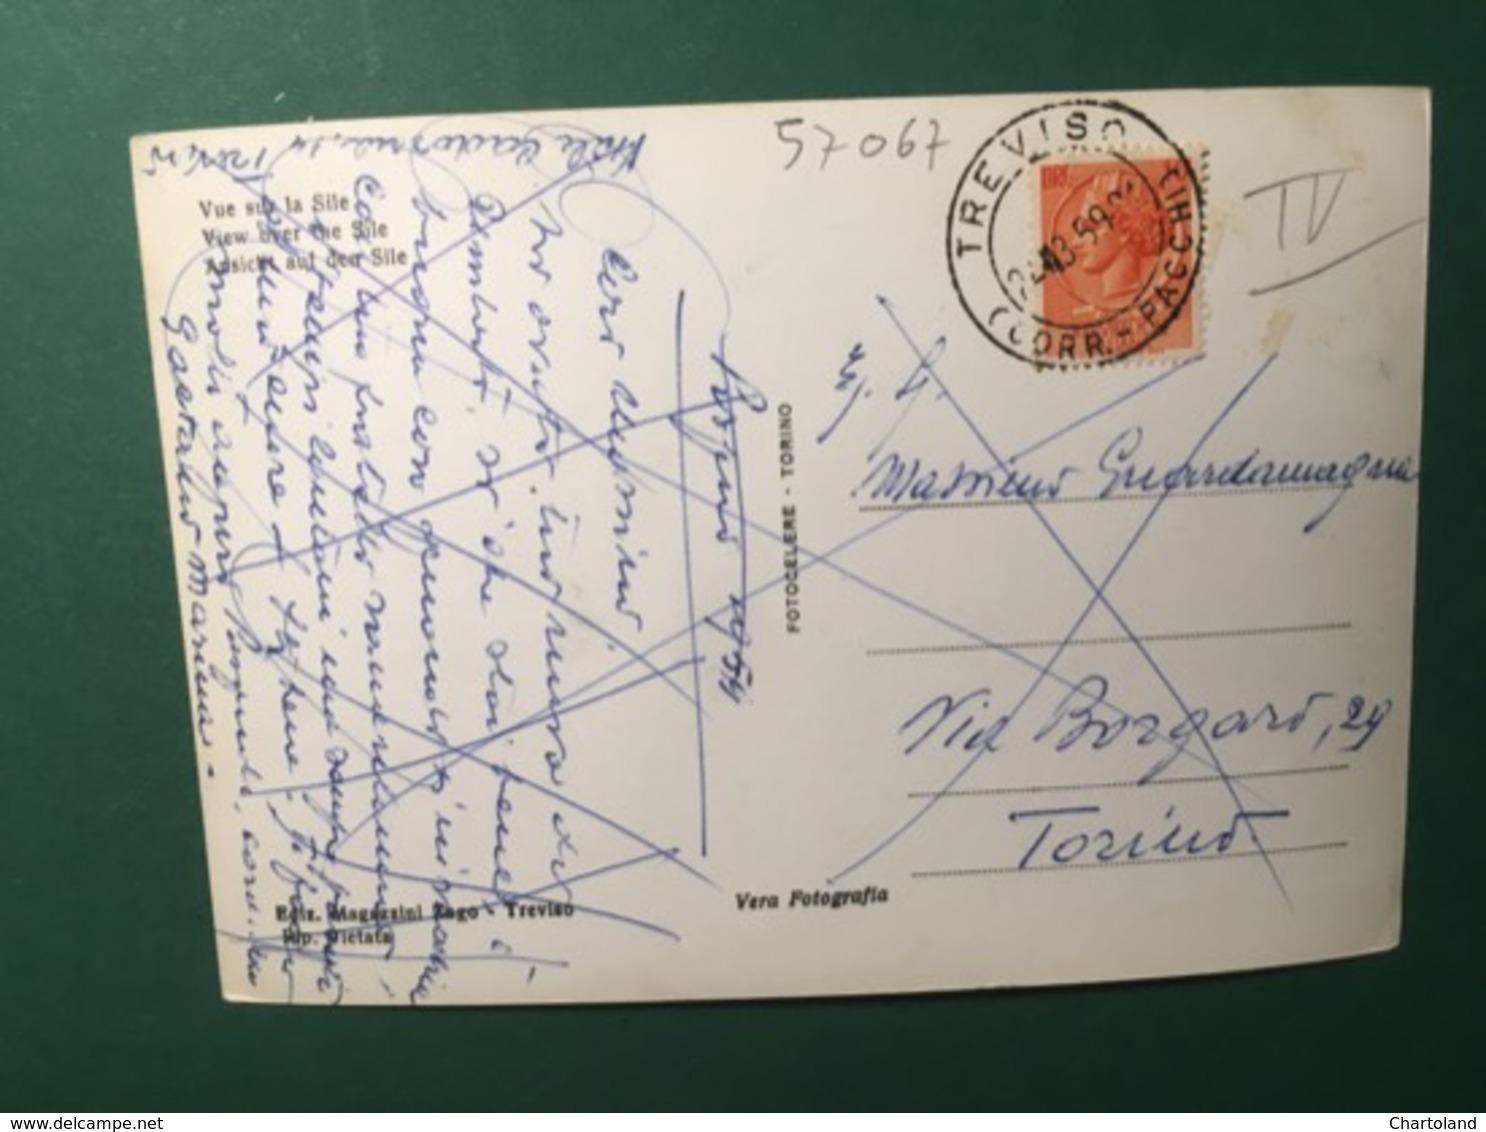 Cartolina Treviso - Veduta Sul Sile - 1959 - Treviso